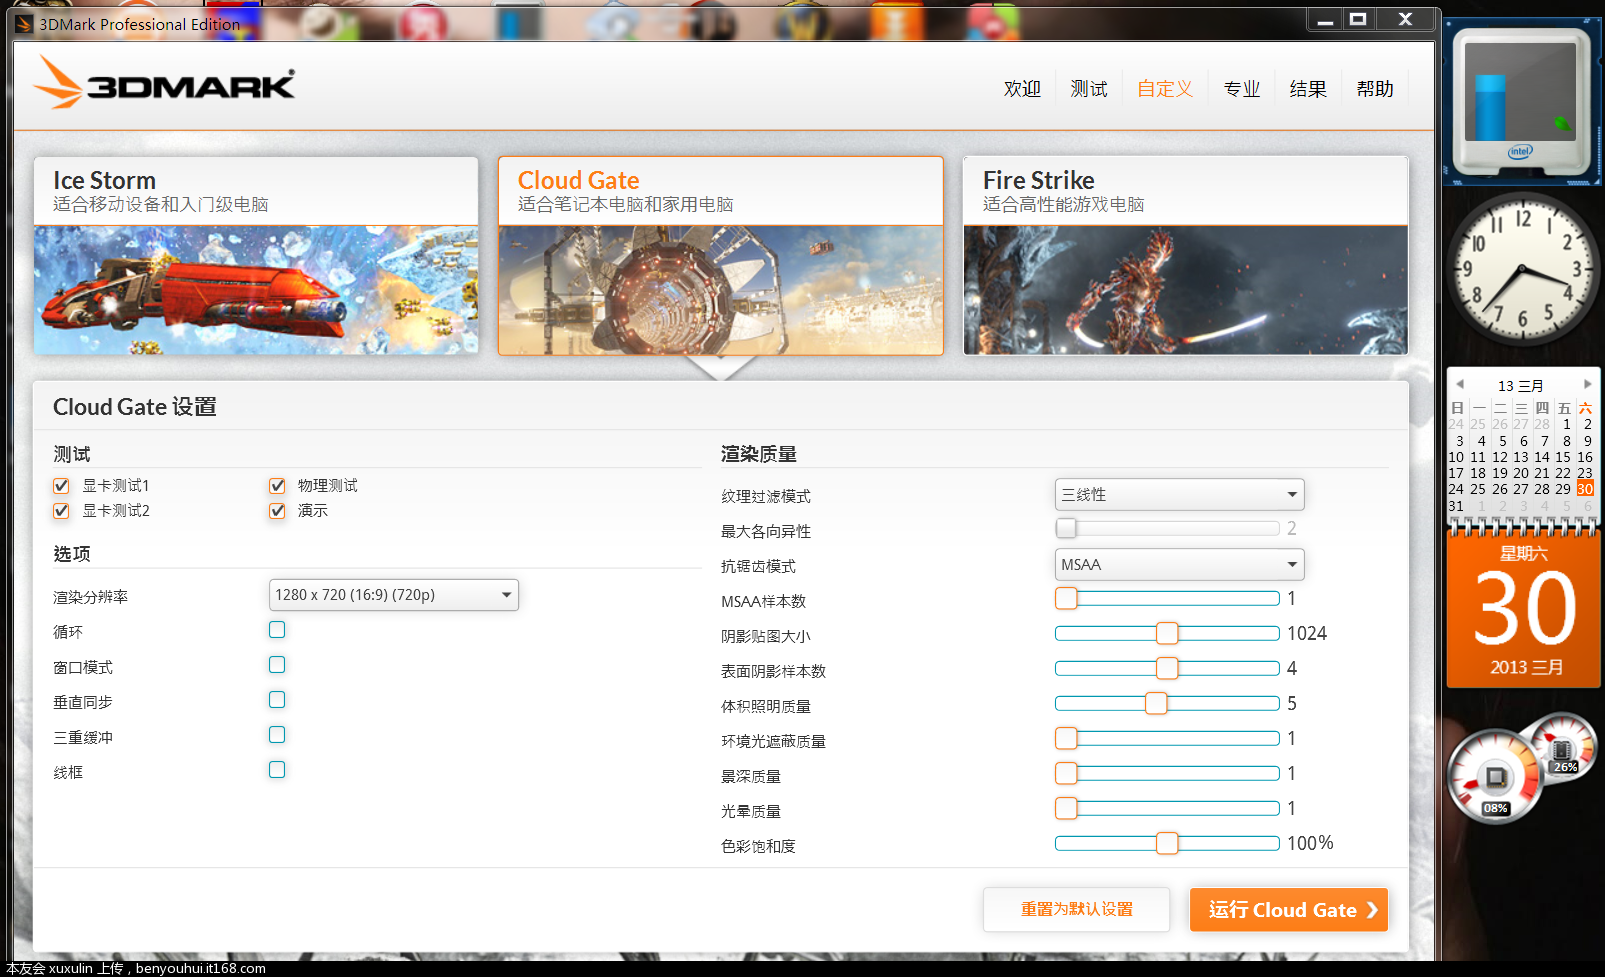 8-1、Cloud Gate 测试默认设置.PNG